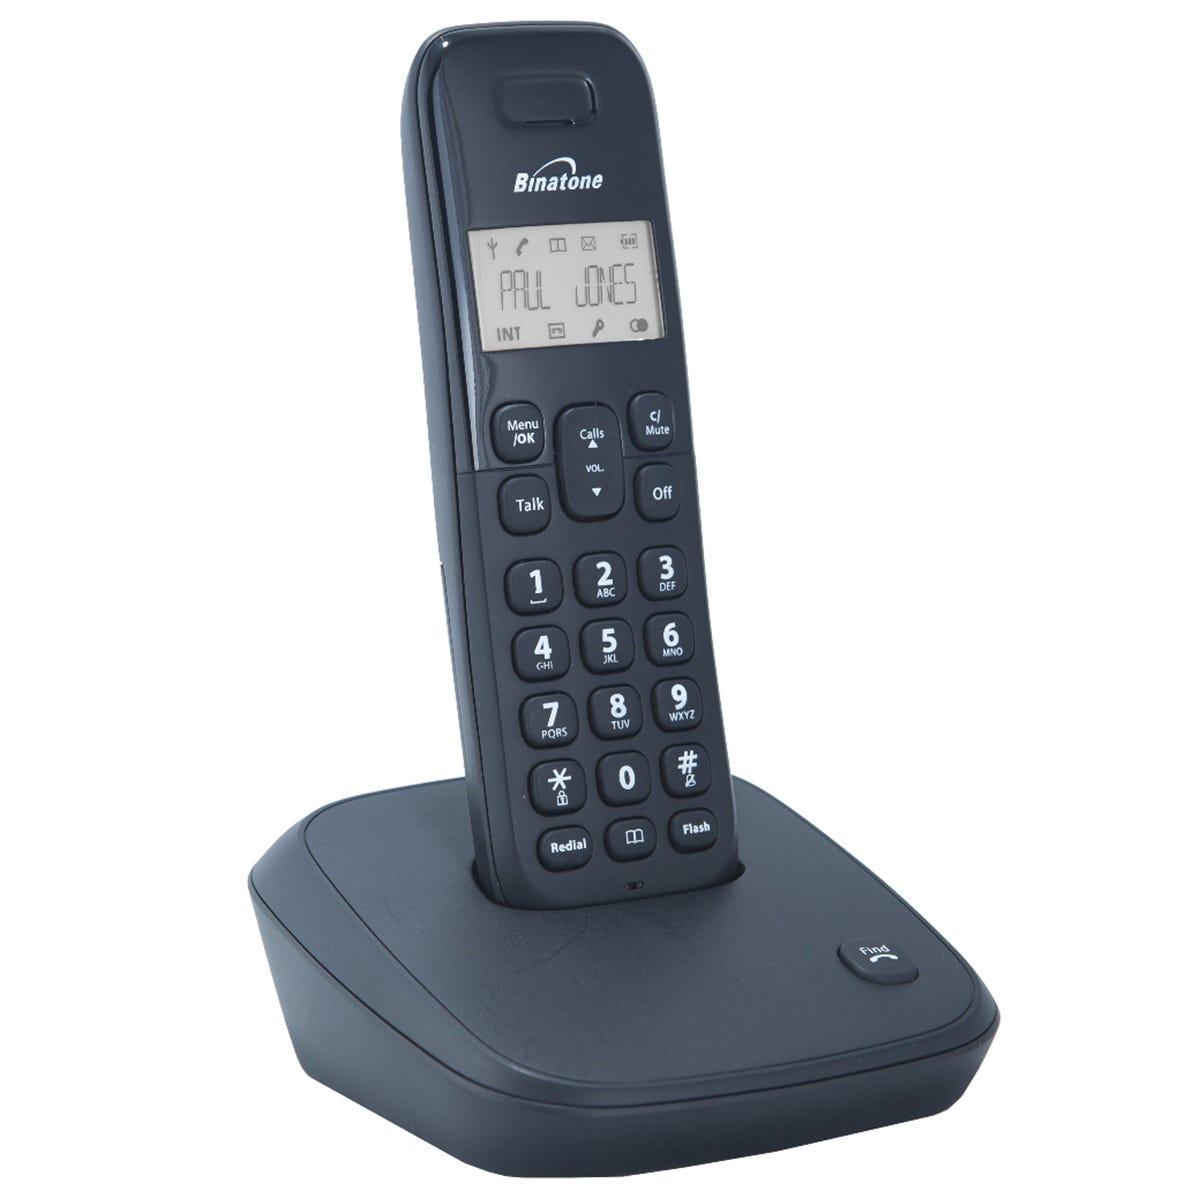 Binatone Veva 1700 DECT Telephone - Single